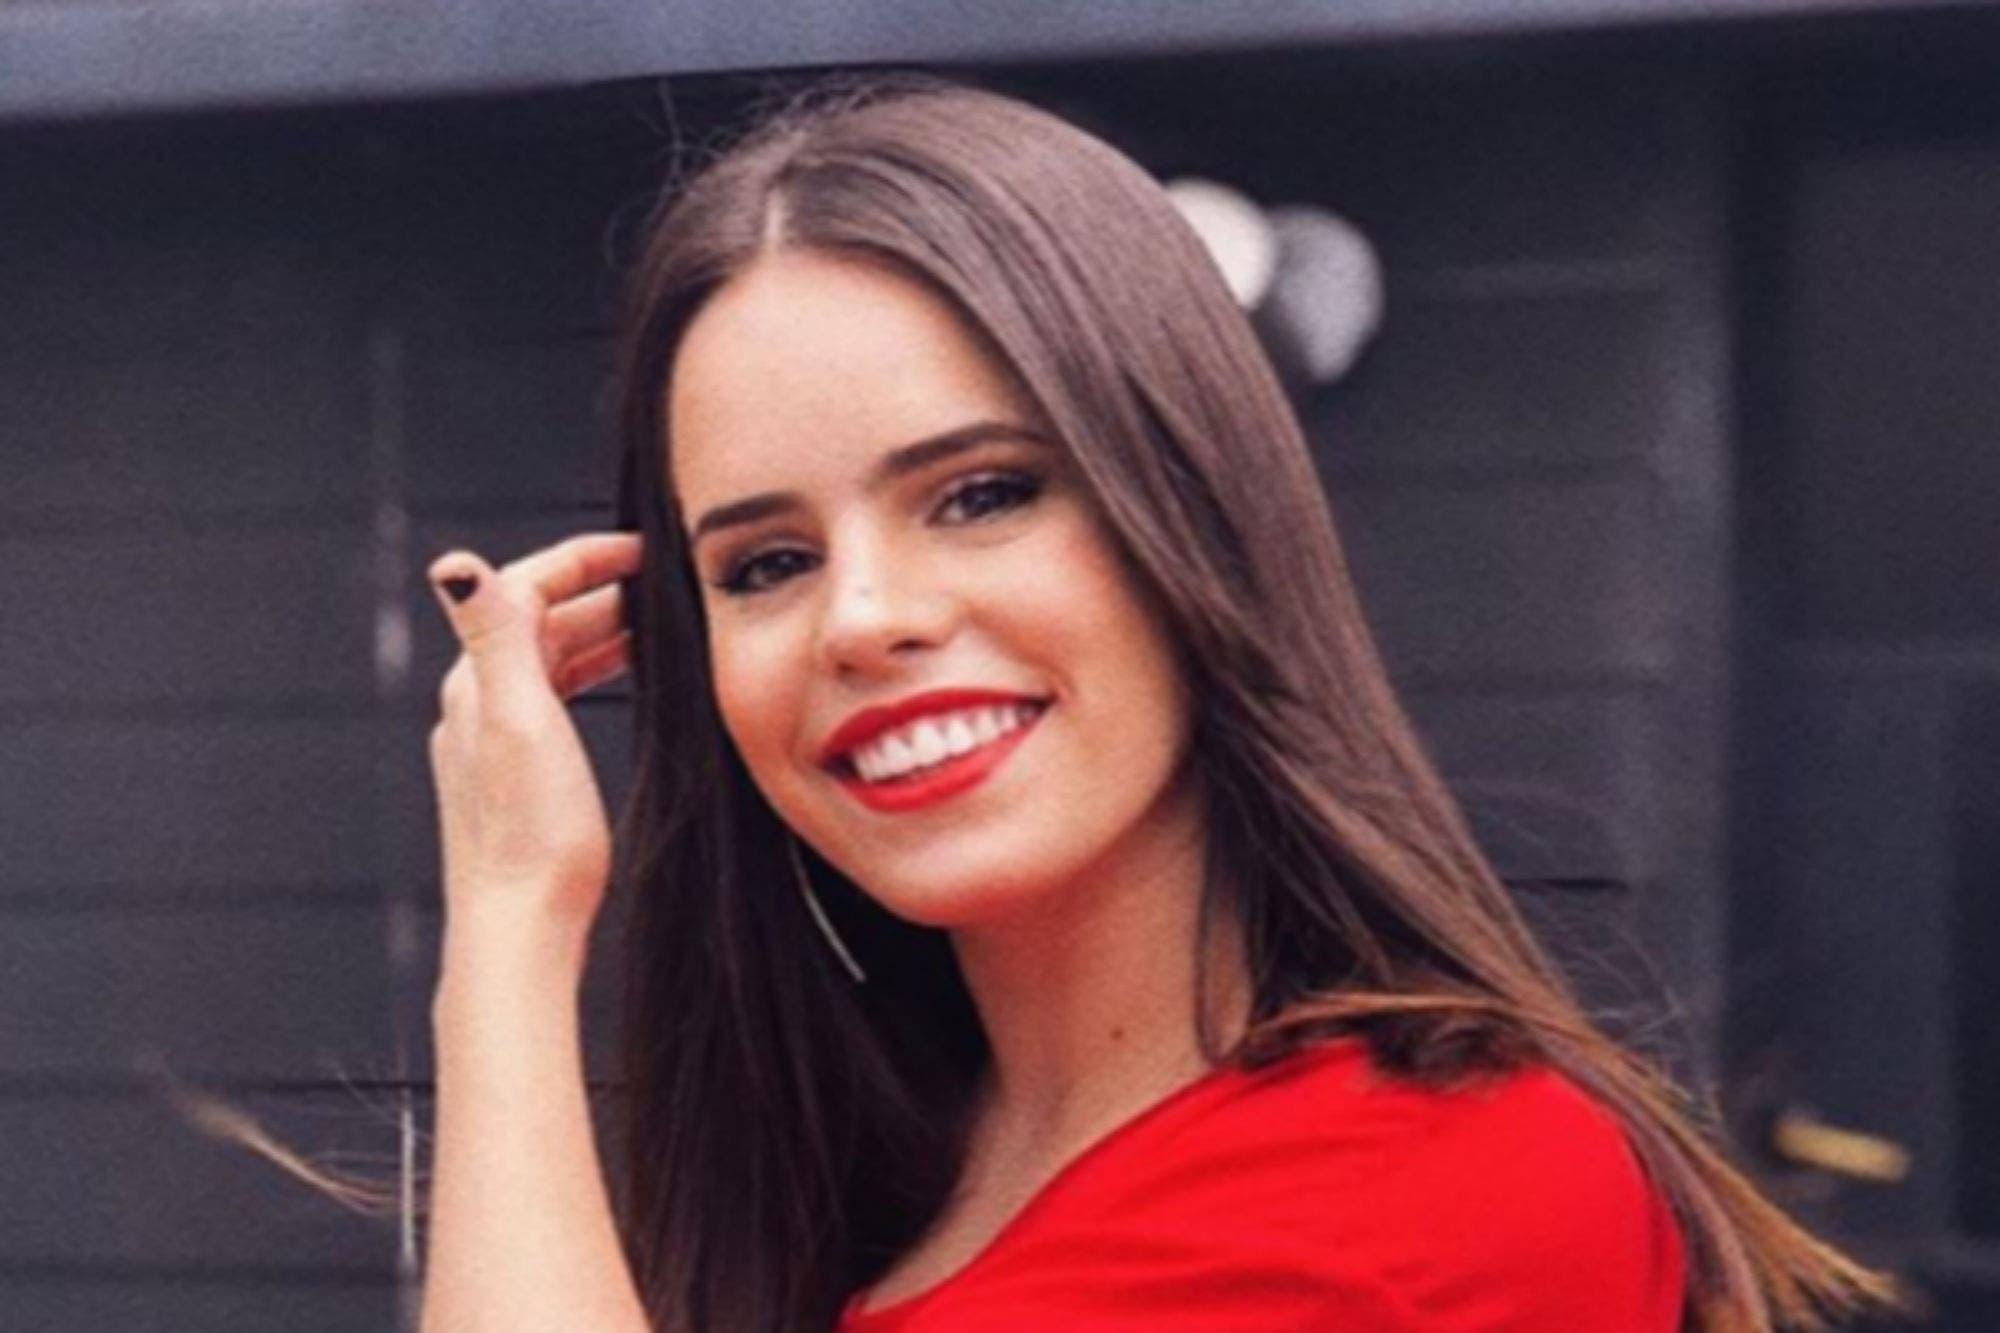 Sofía Morandi